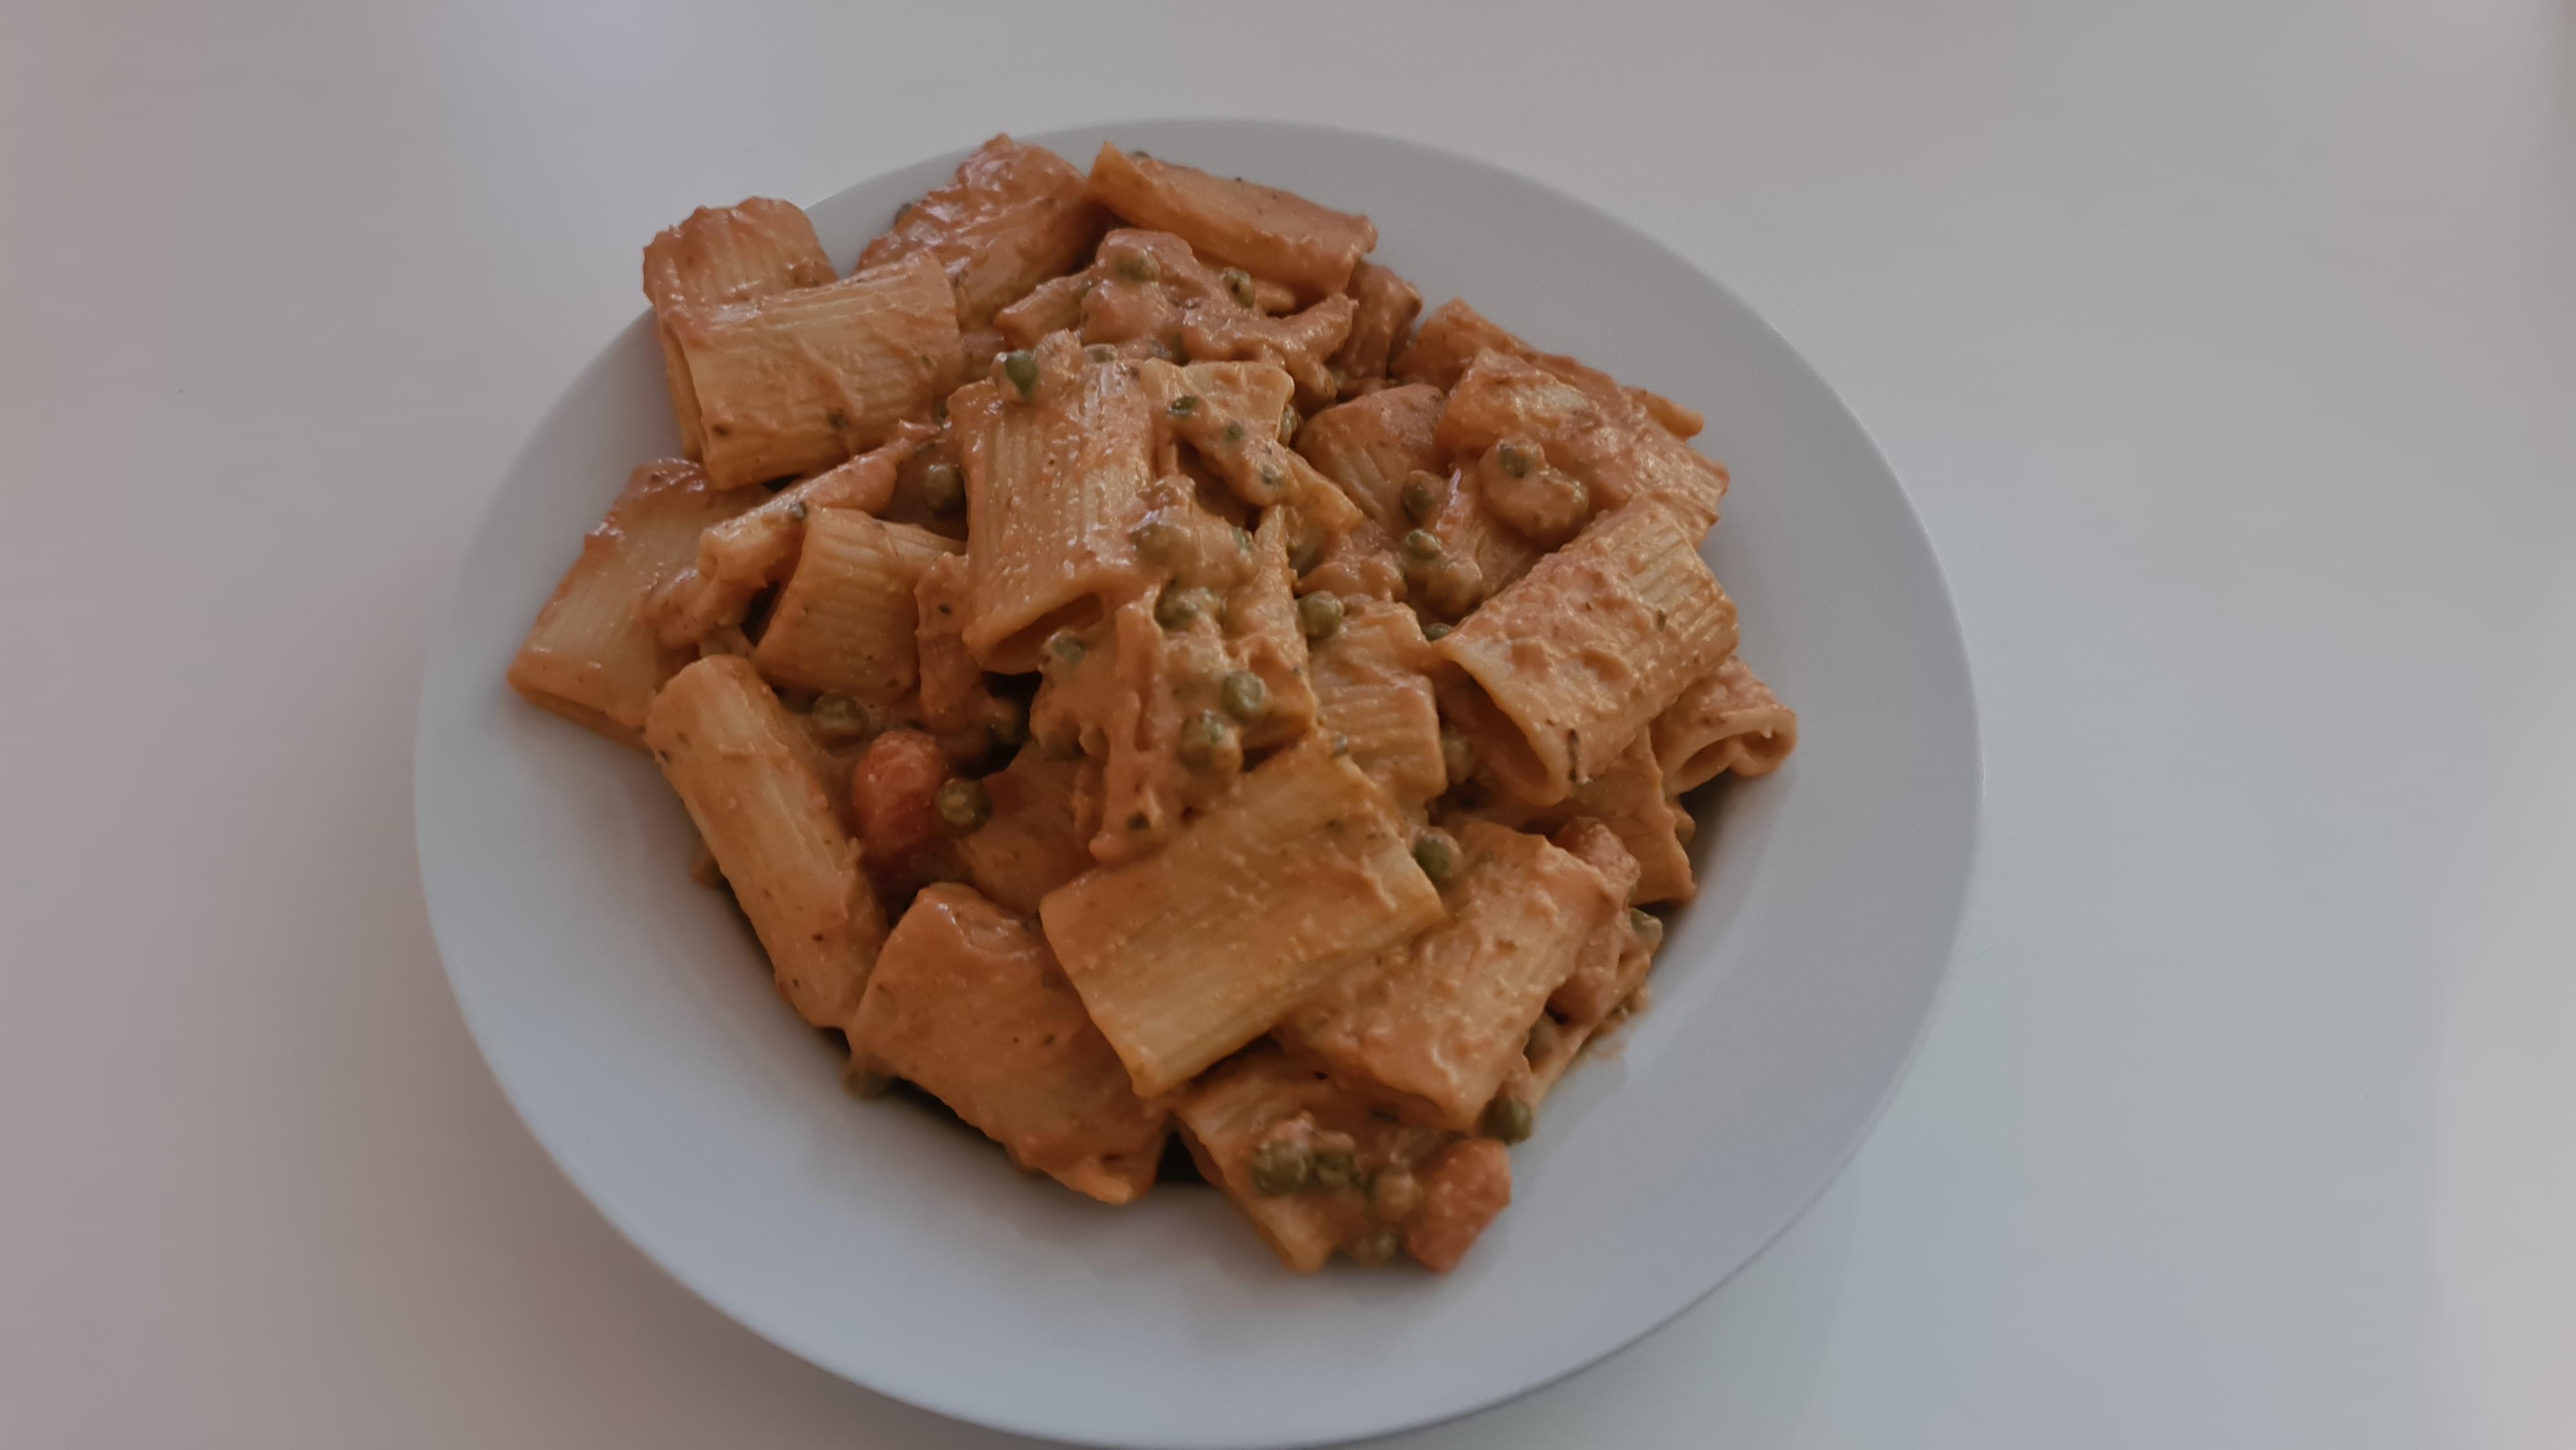 https://foodloader.net/Holz_2020-07-07_Rigatoni_Ricotta_e_Noci.jpg